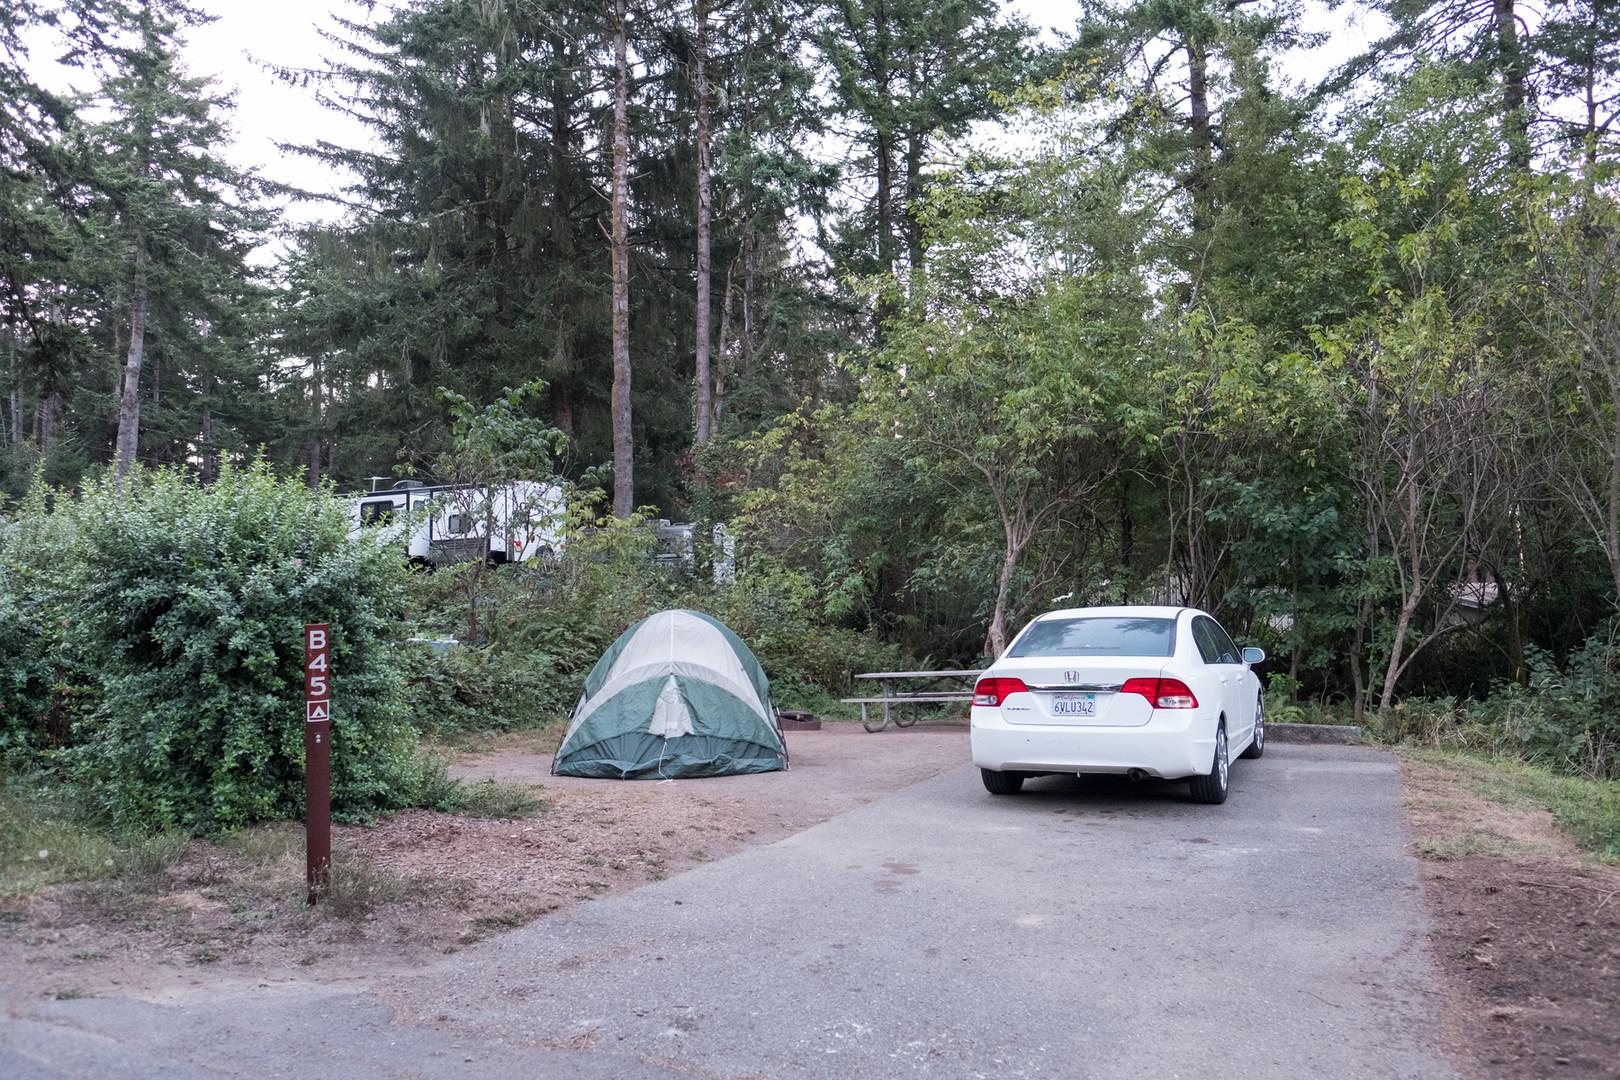 Yurt Beach Camping California